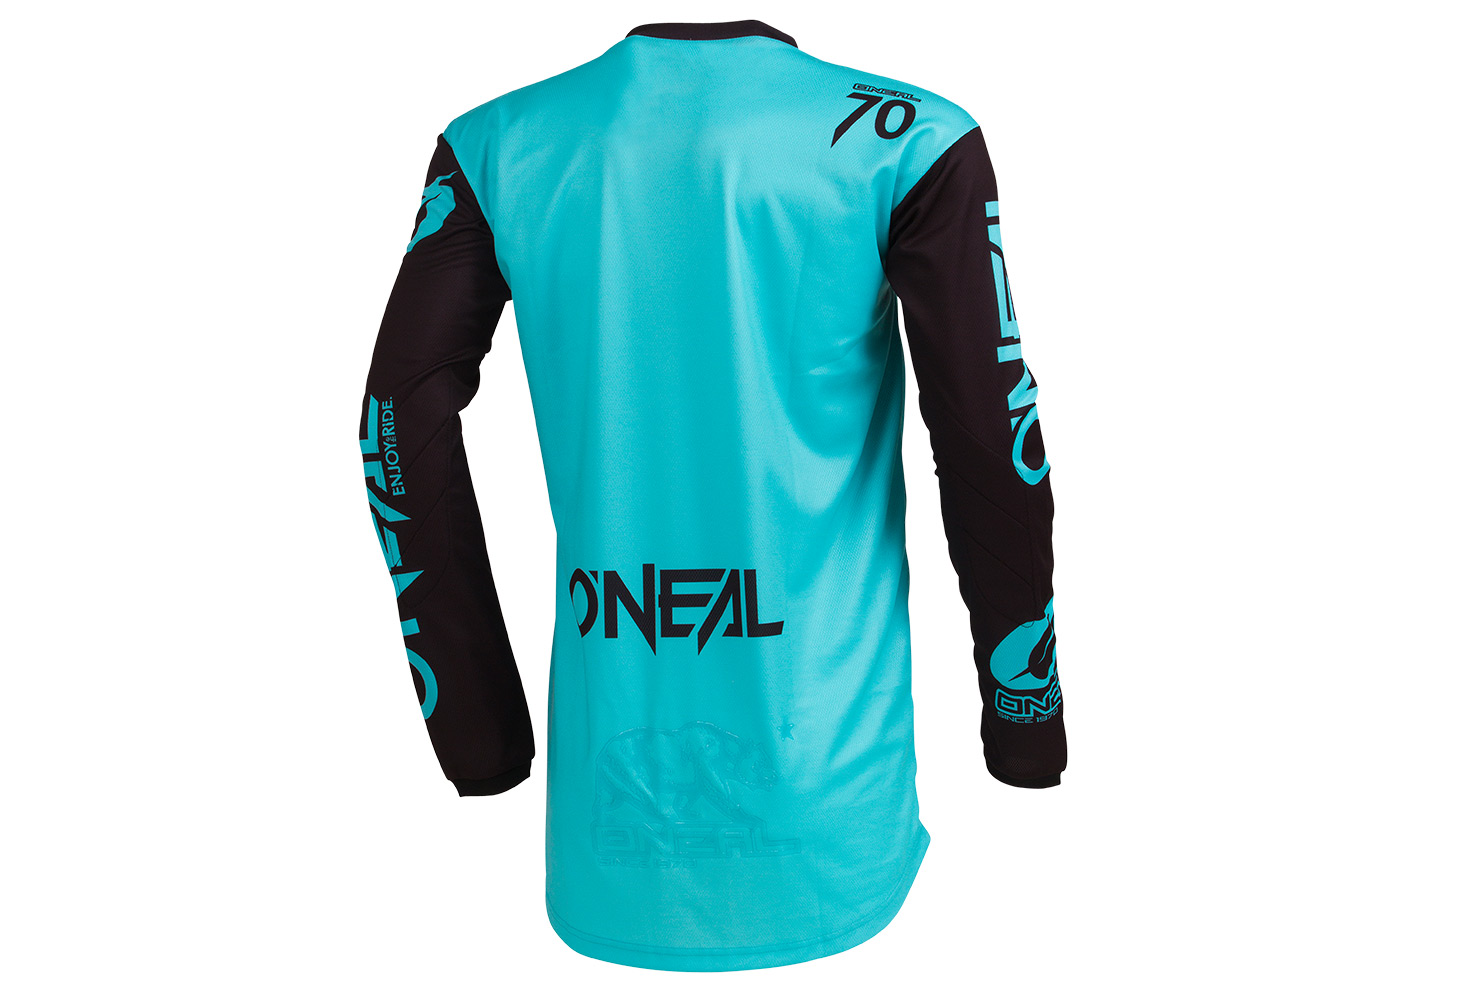 Oneal THREAT Jersey RIDER teal M blau